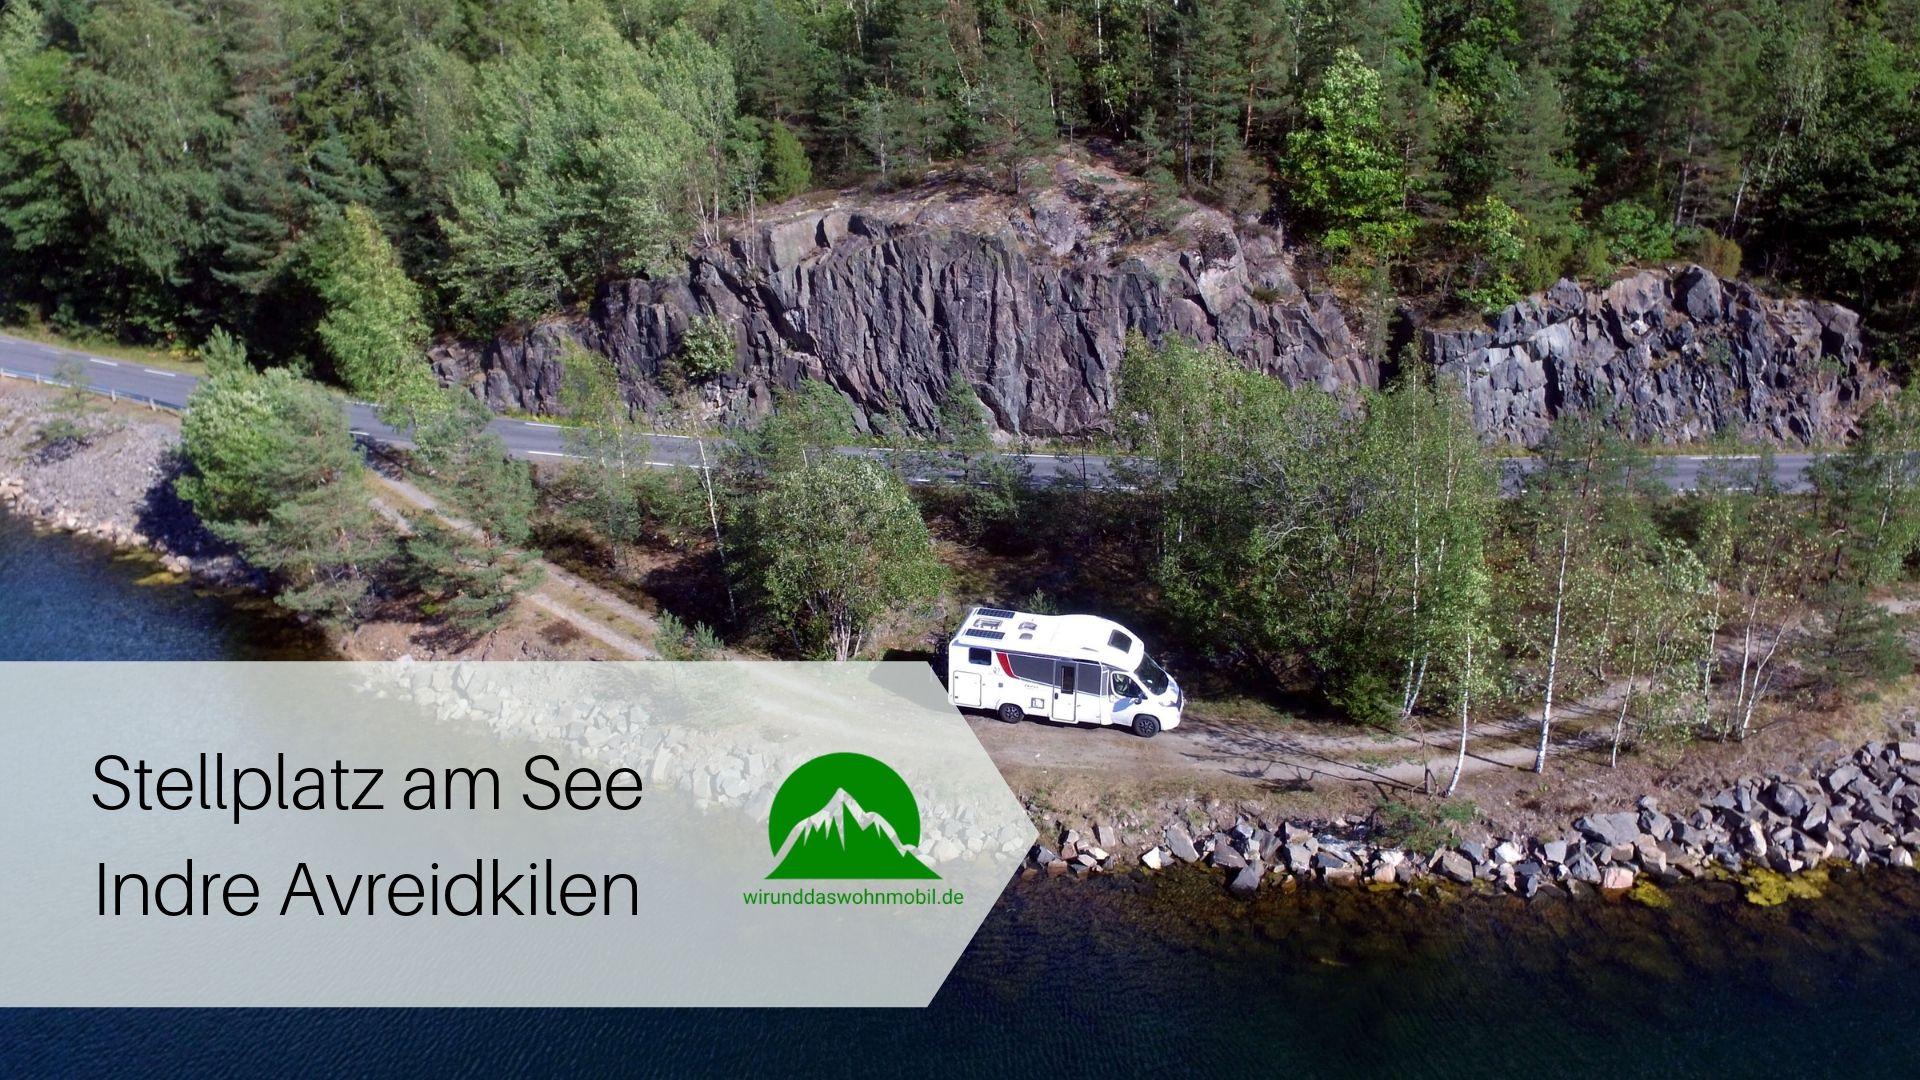 Wohnmobil am See Indre Avreidkilen in Norwegen